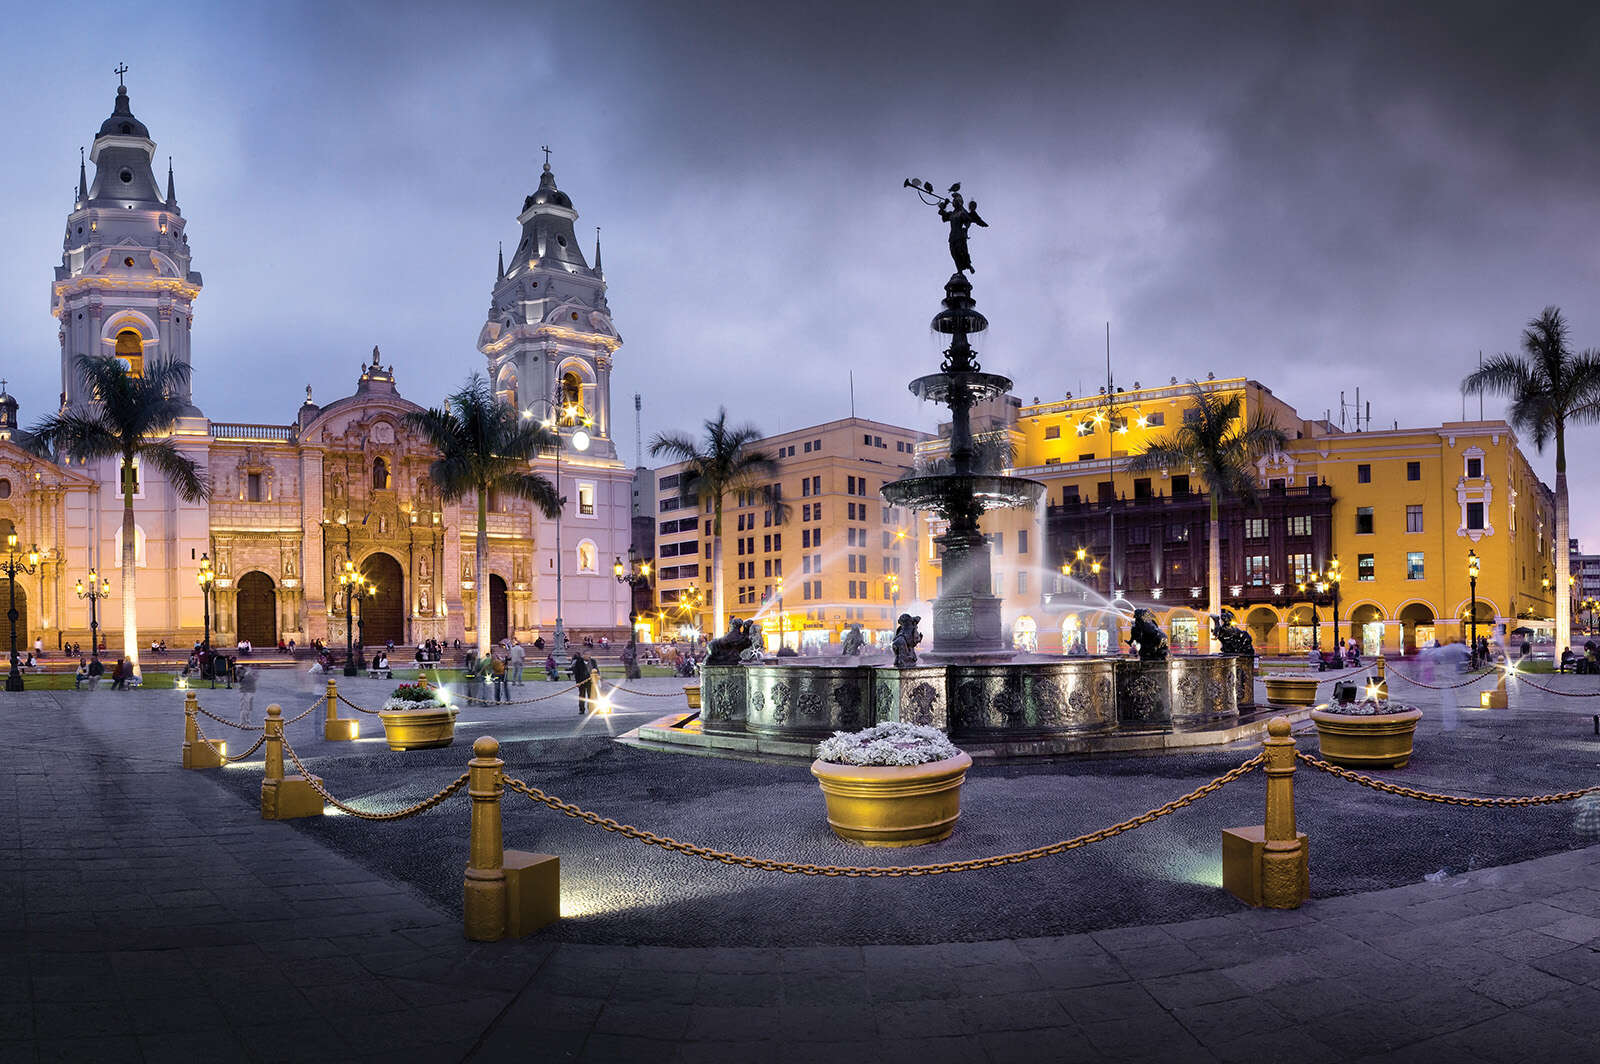 Goway Travel - Wonders of Peru with International Airfare